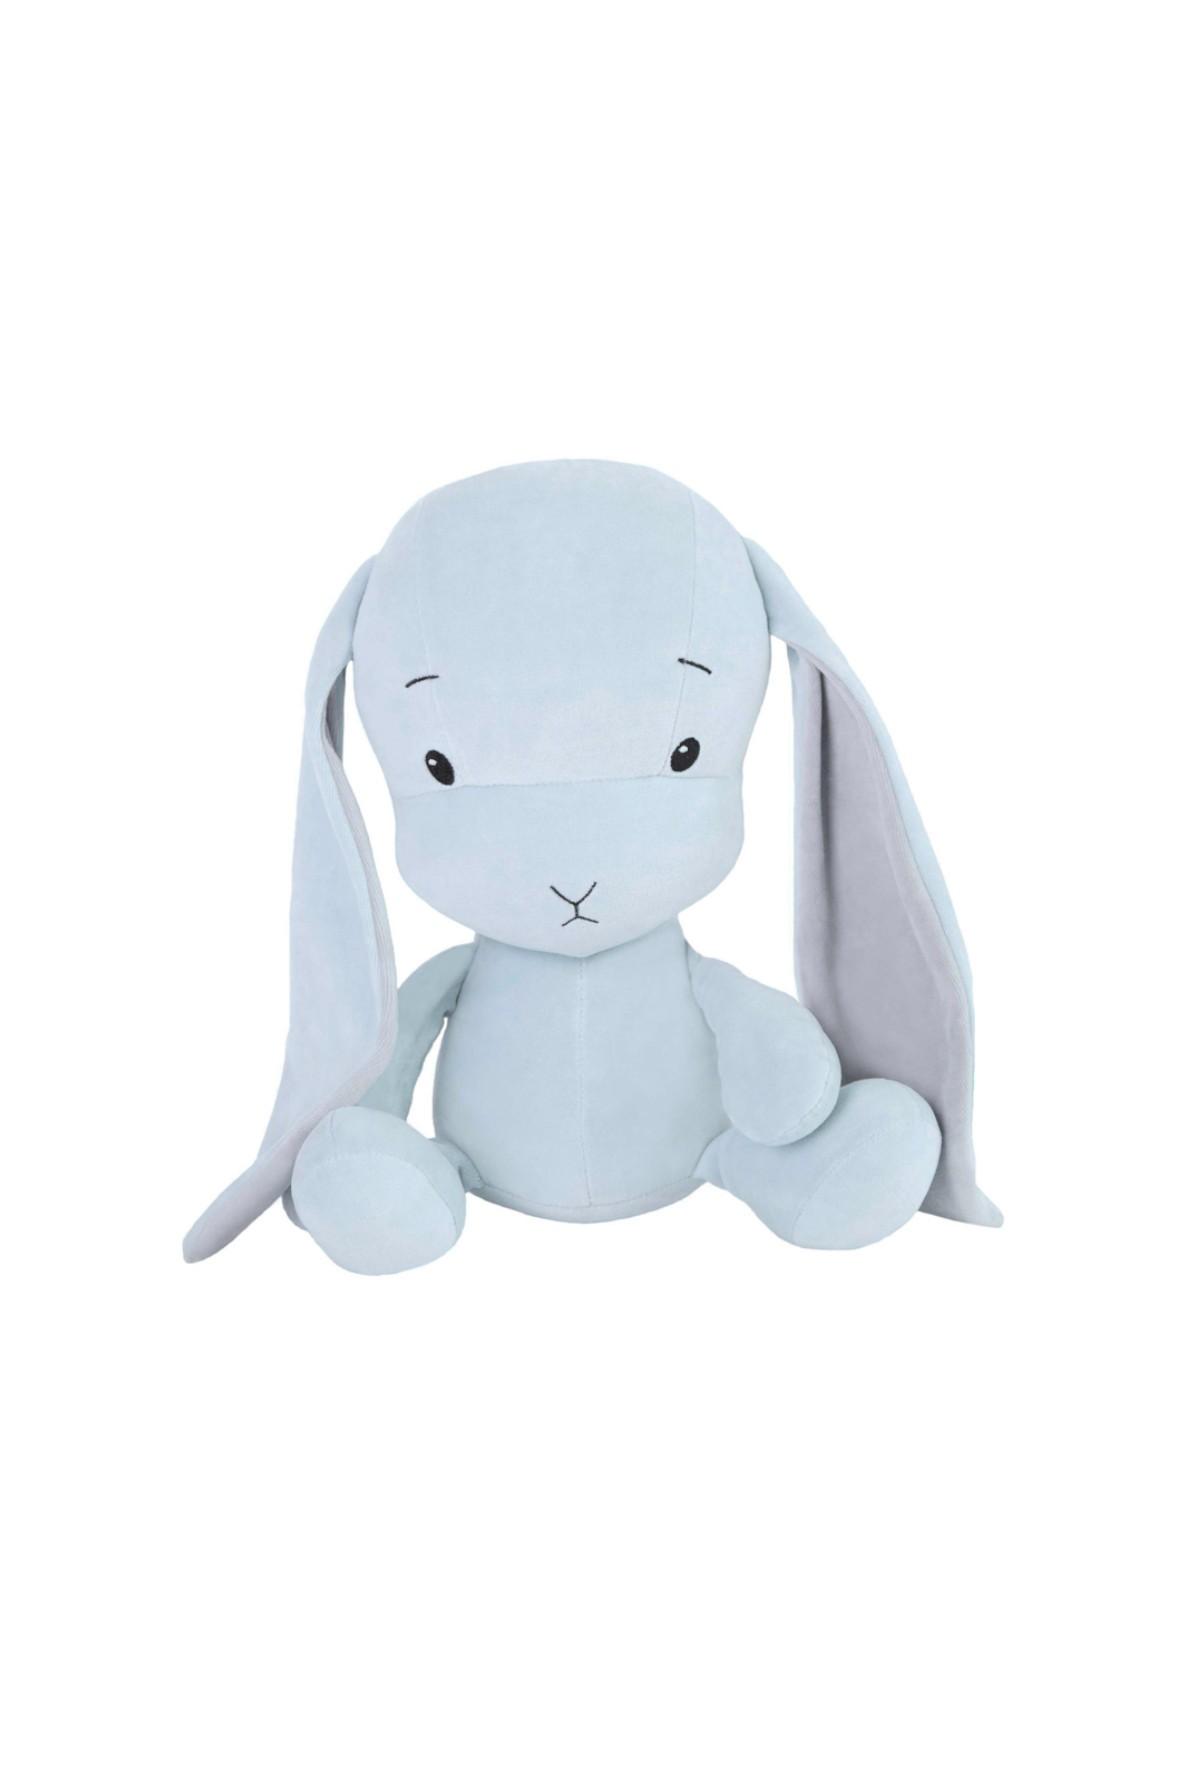 Królik Effik niebieski szare uszy